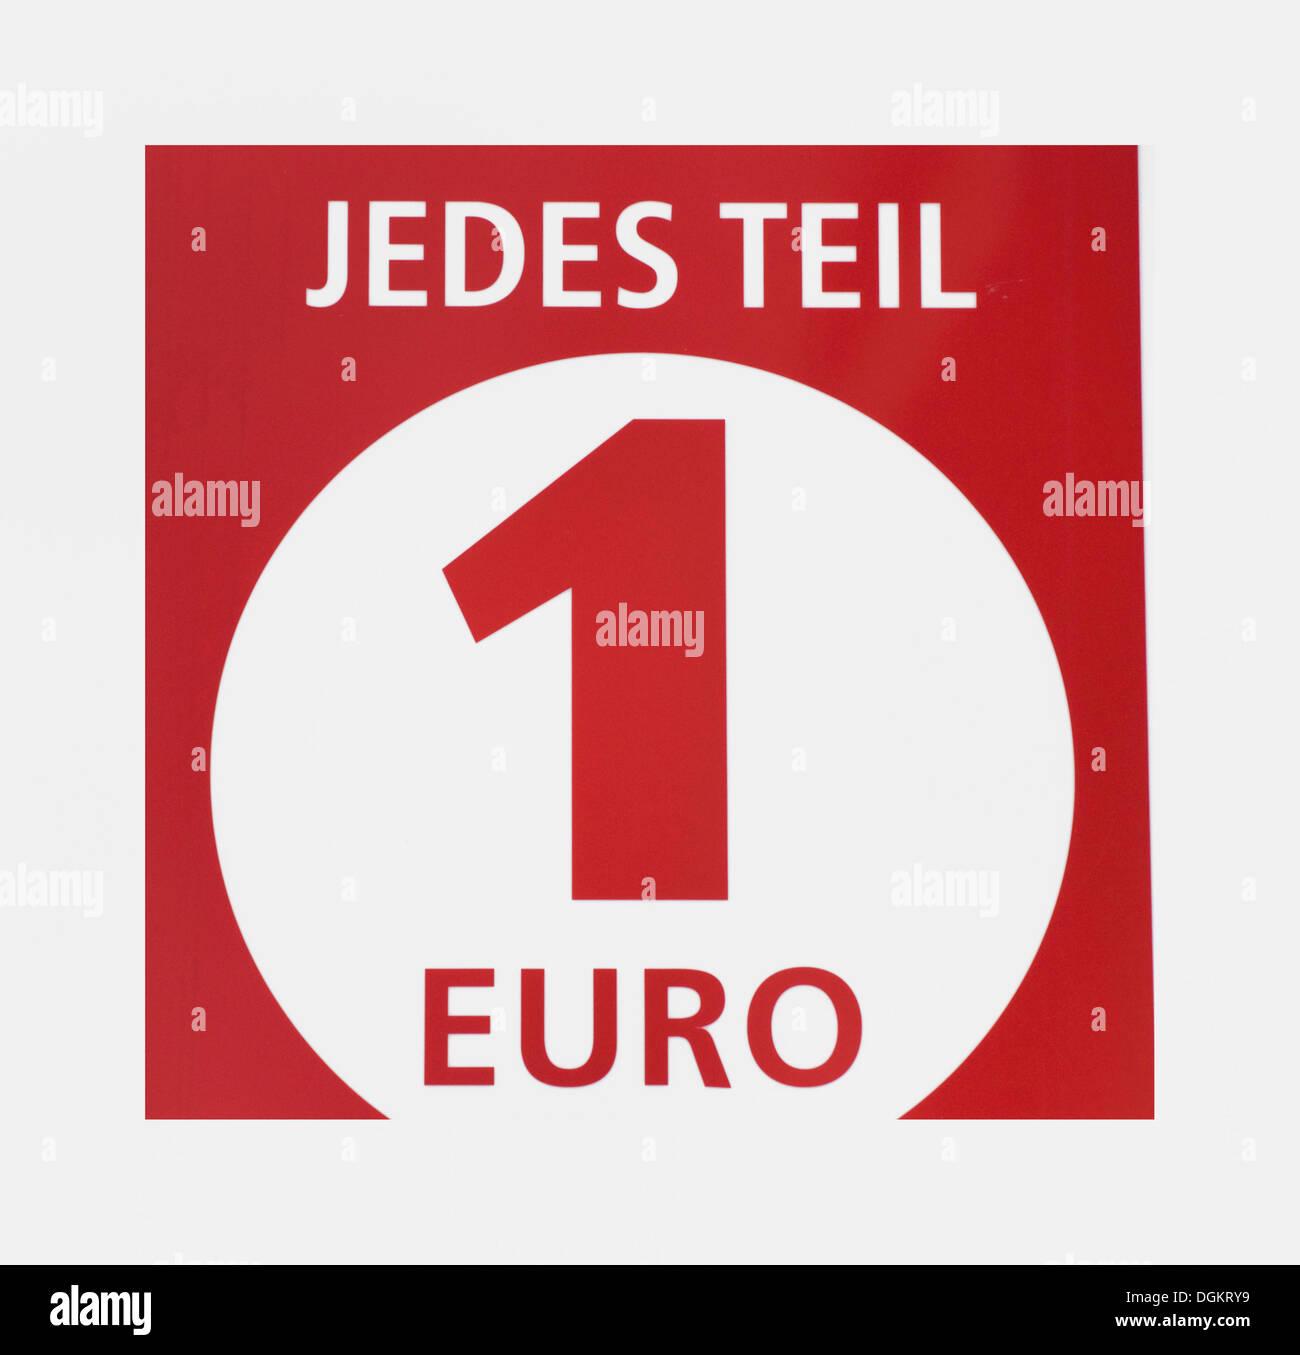 1 euro shop stock photos 1 euro shop stock images alamy jedes teil 1 euro german for every item 1 euro euro shop biocorpaavc